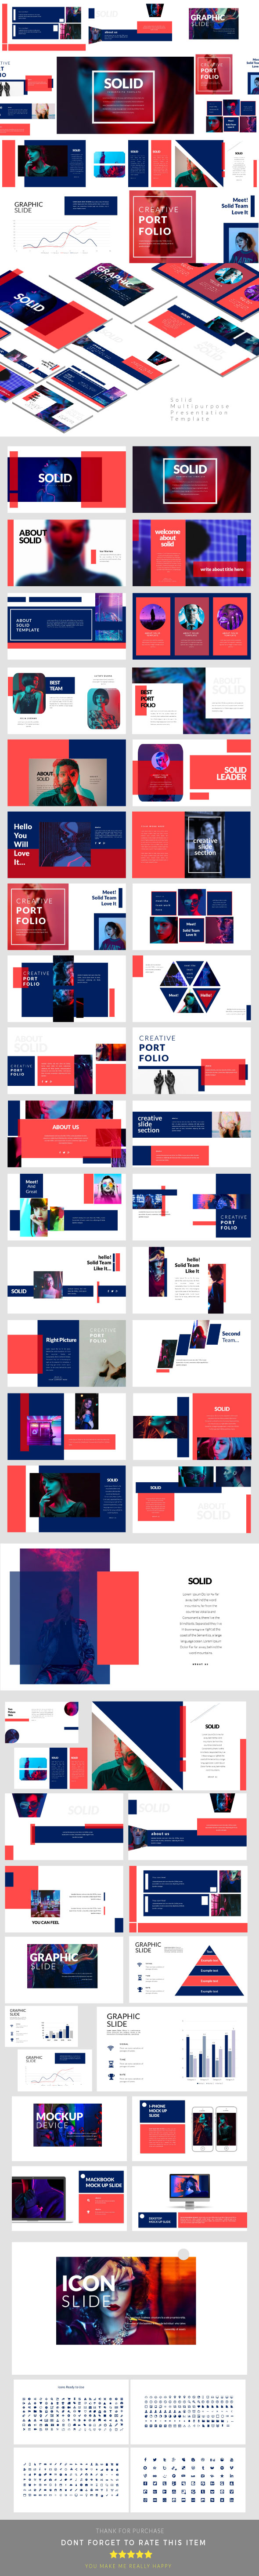 GraphicRiver Solid Creative Keynote Presentation Templates 21010555